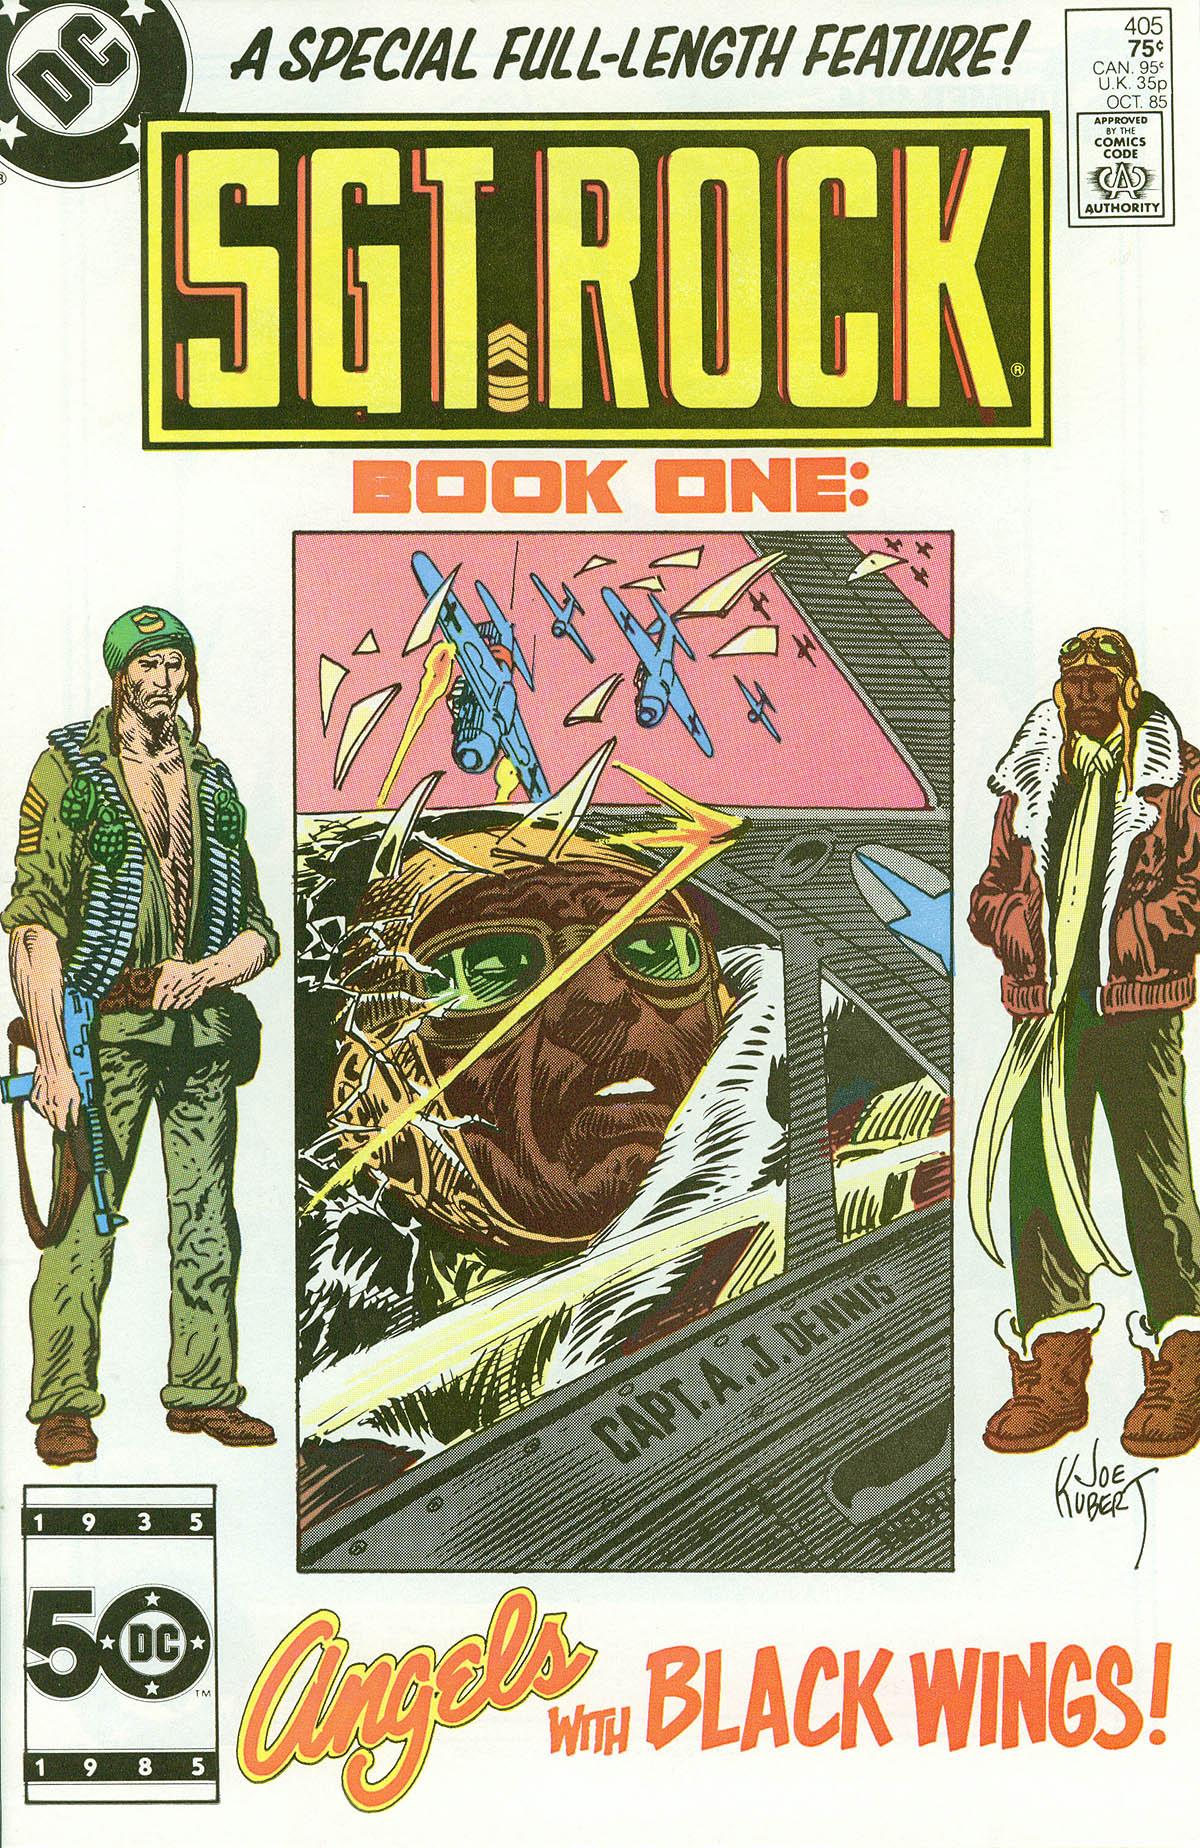 Read online Sgt. Rock comic -  Issue #405 - 1